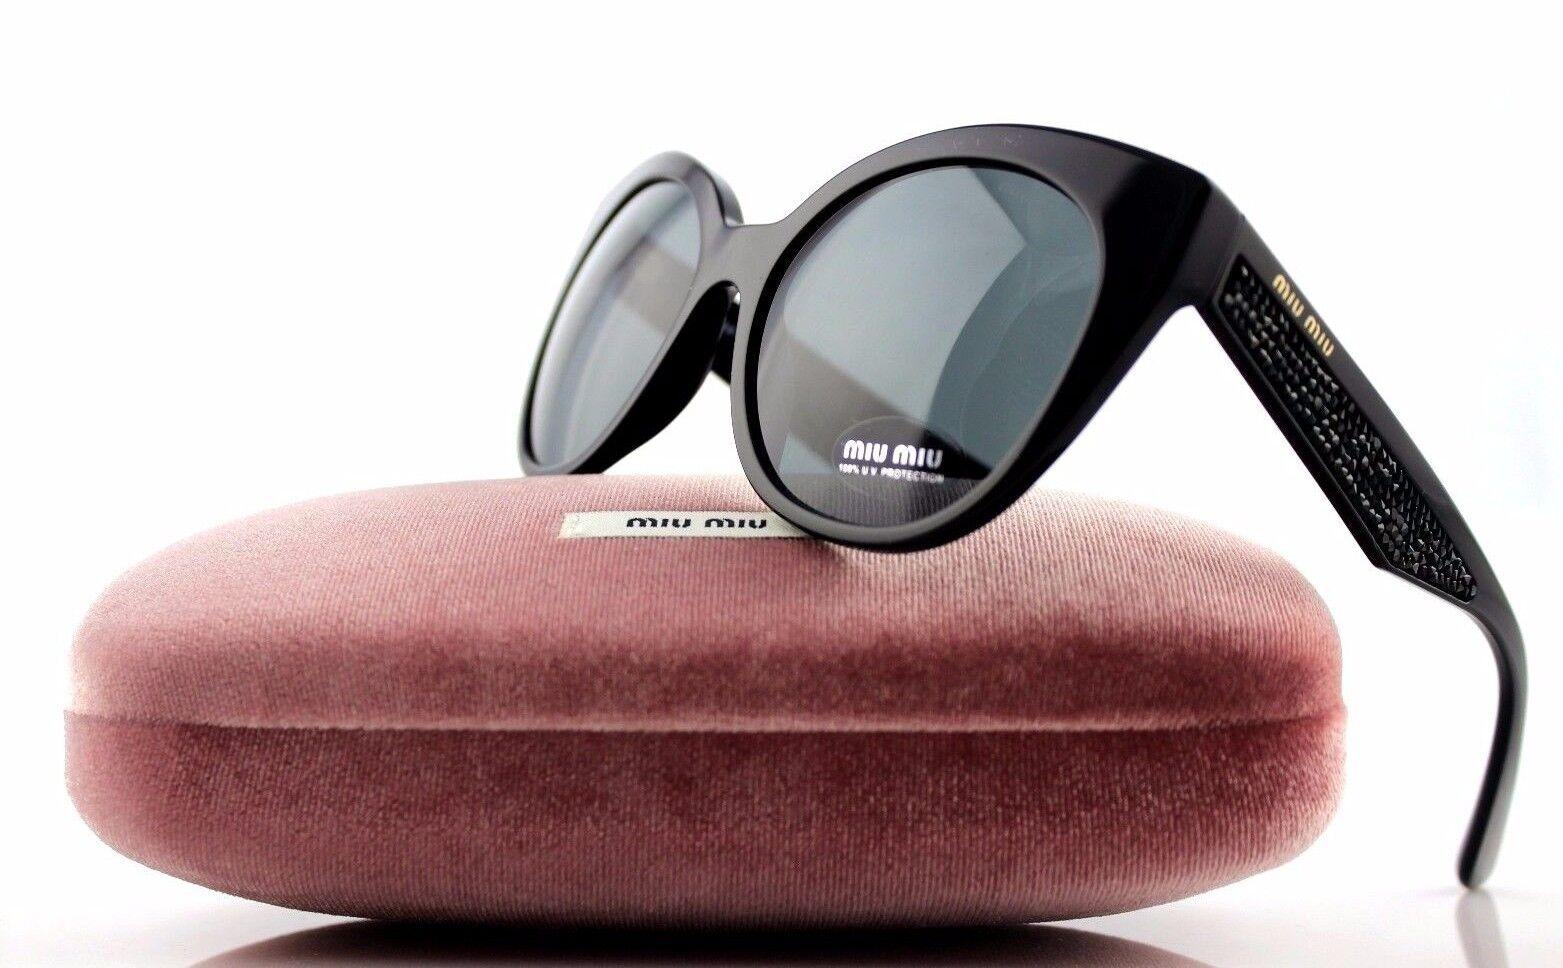 be5152b2ad2 MIU MIU Sunglasses 07rs 1ab1a1 Black Grey for sale online